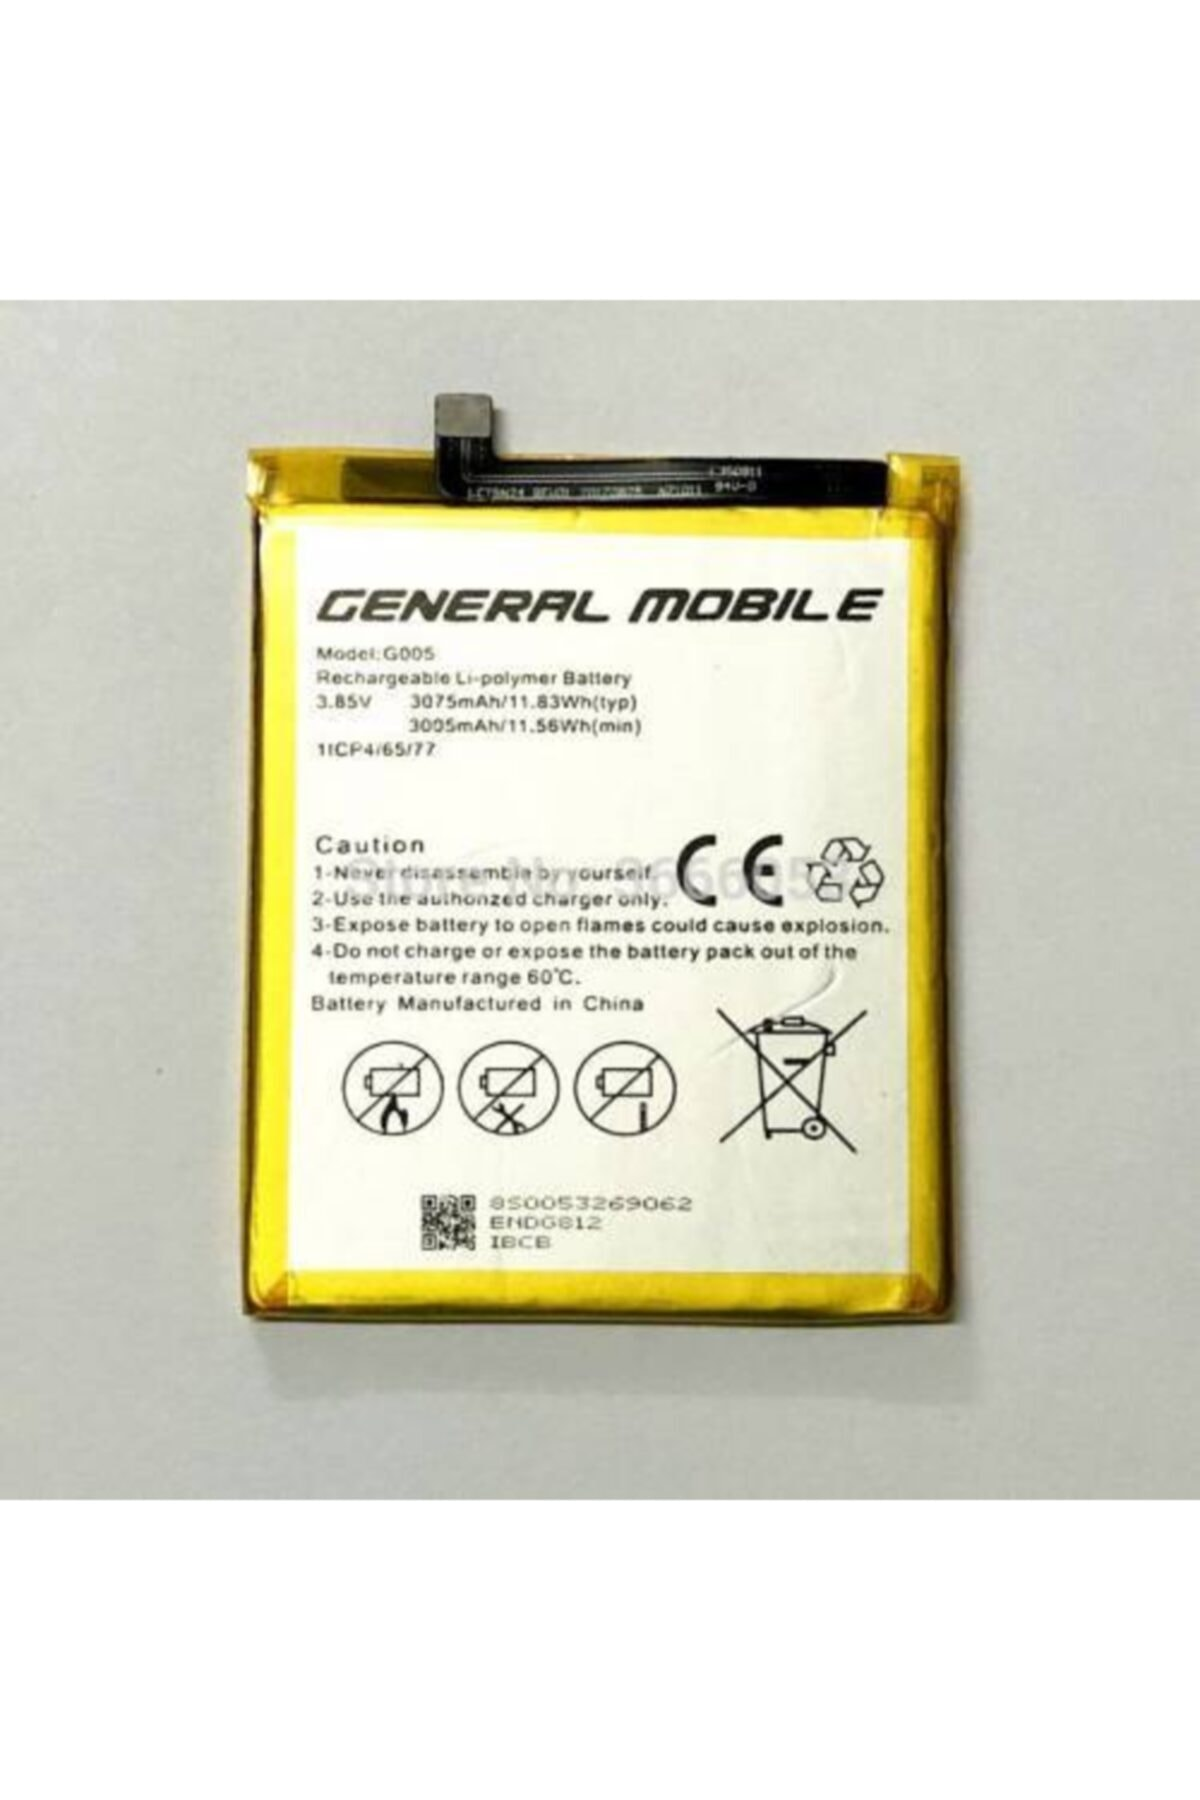 General Mobile Gm8 Batarya Orjinal Pil G005 1